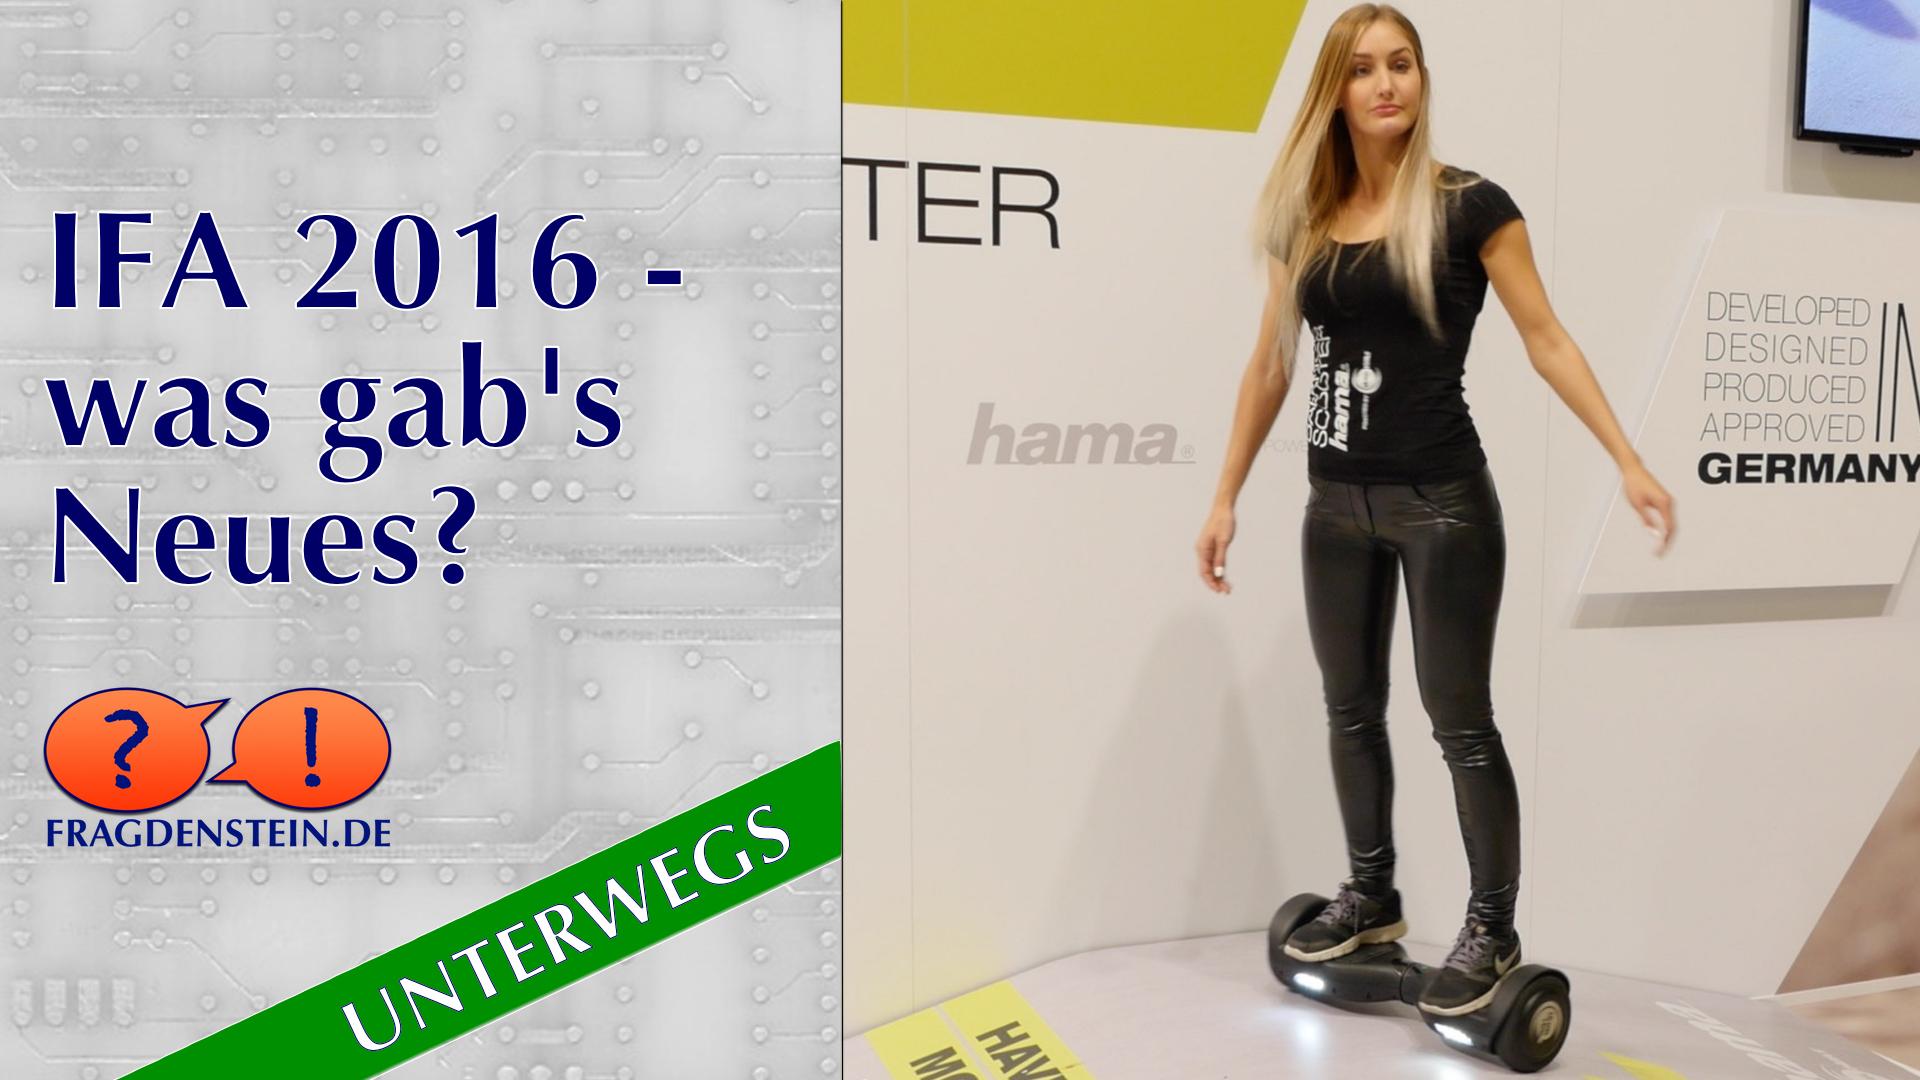 IFA 2016 - was gab's Neues?